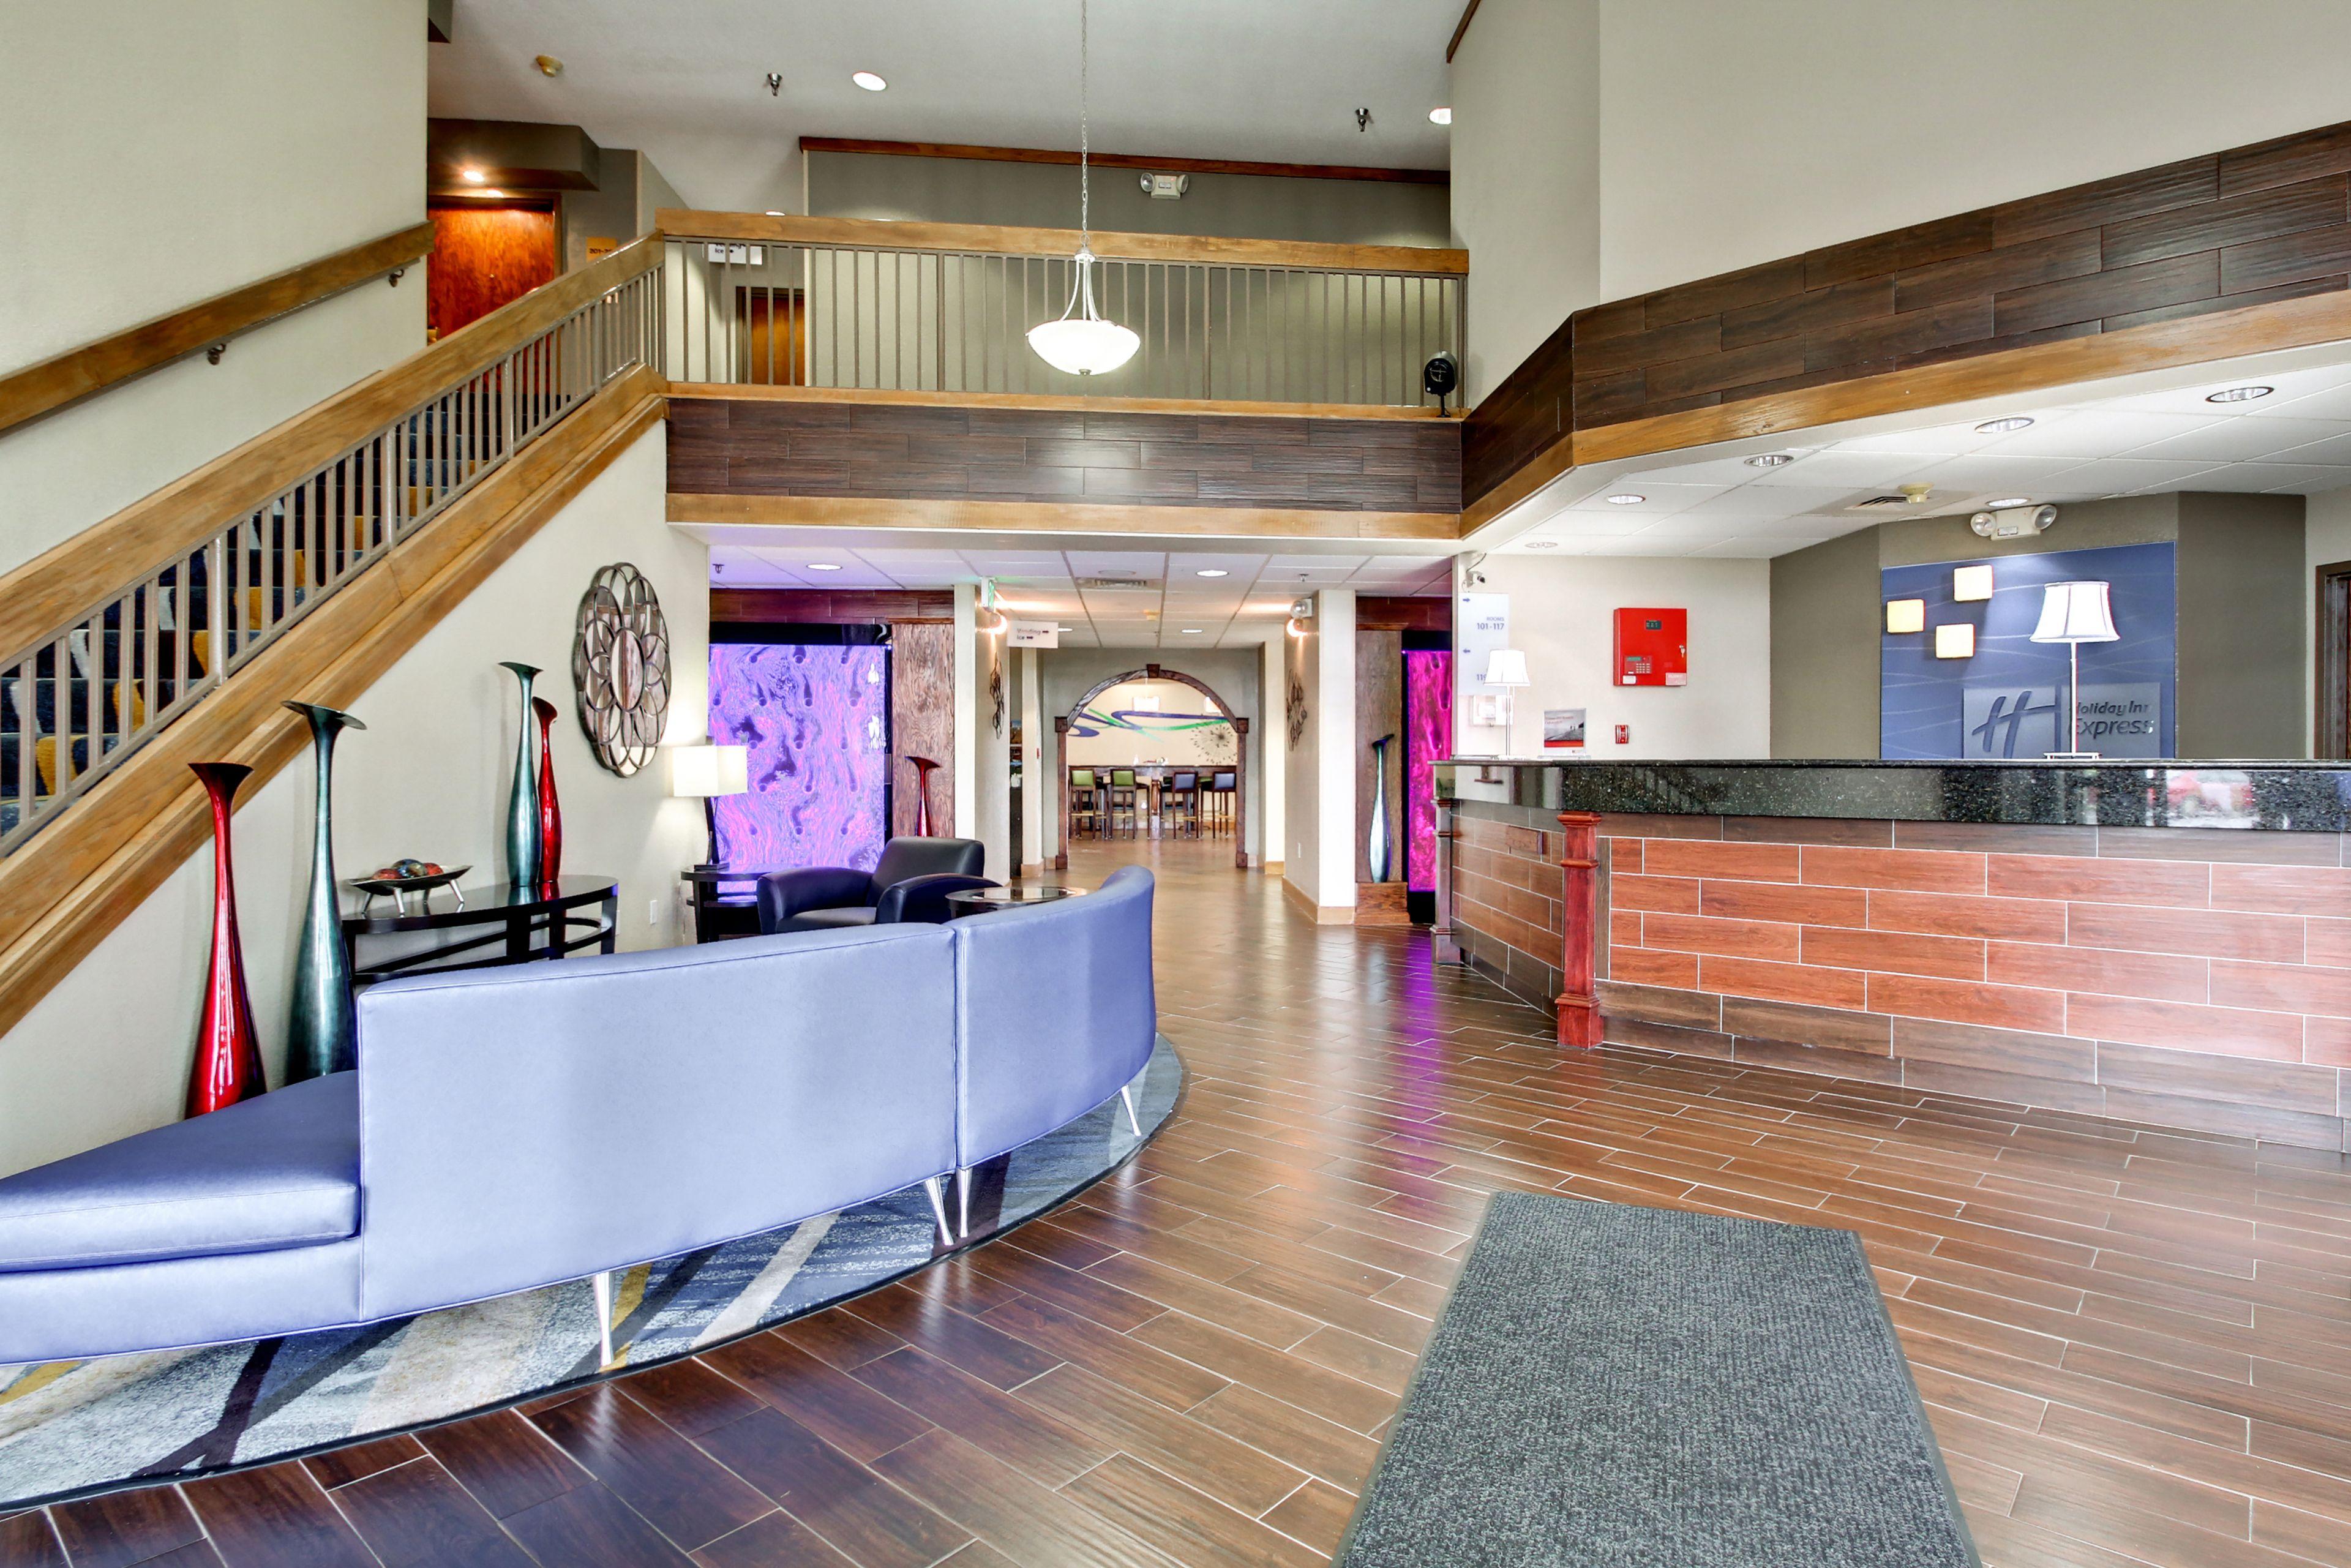 Holiday Inn Express Marshfield (Springfield Area) image 7